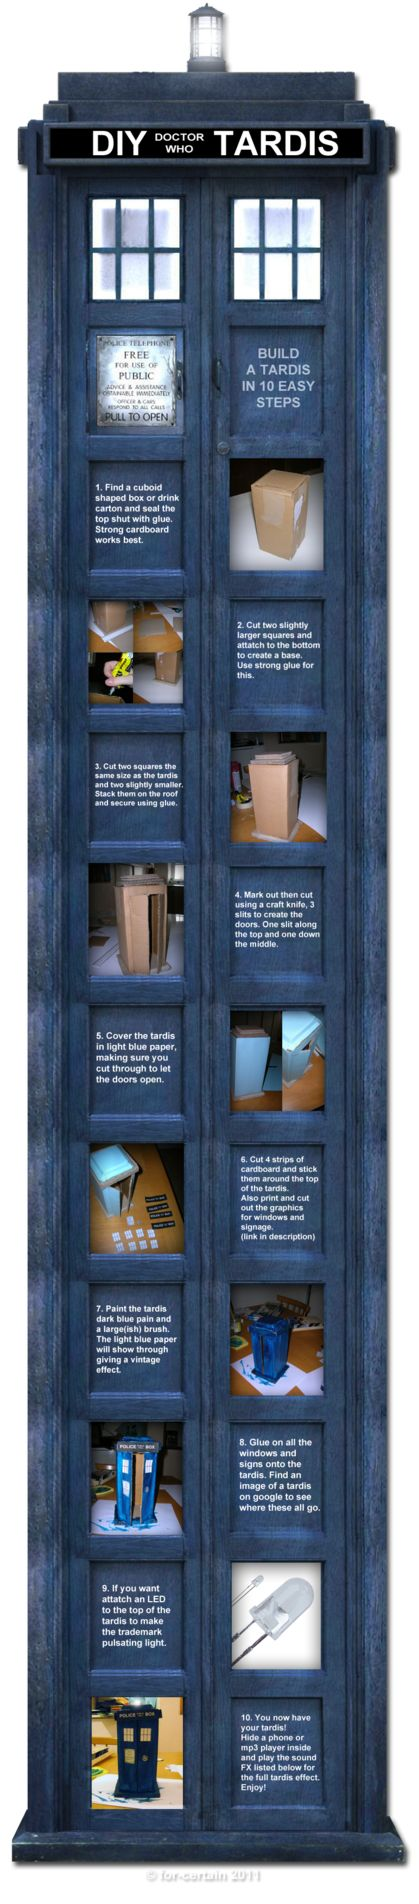 DIY TARDIS